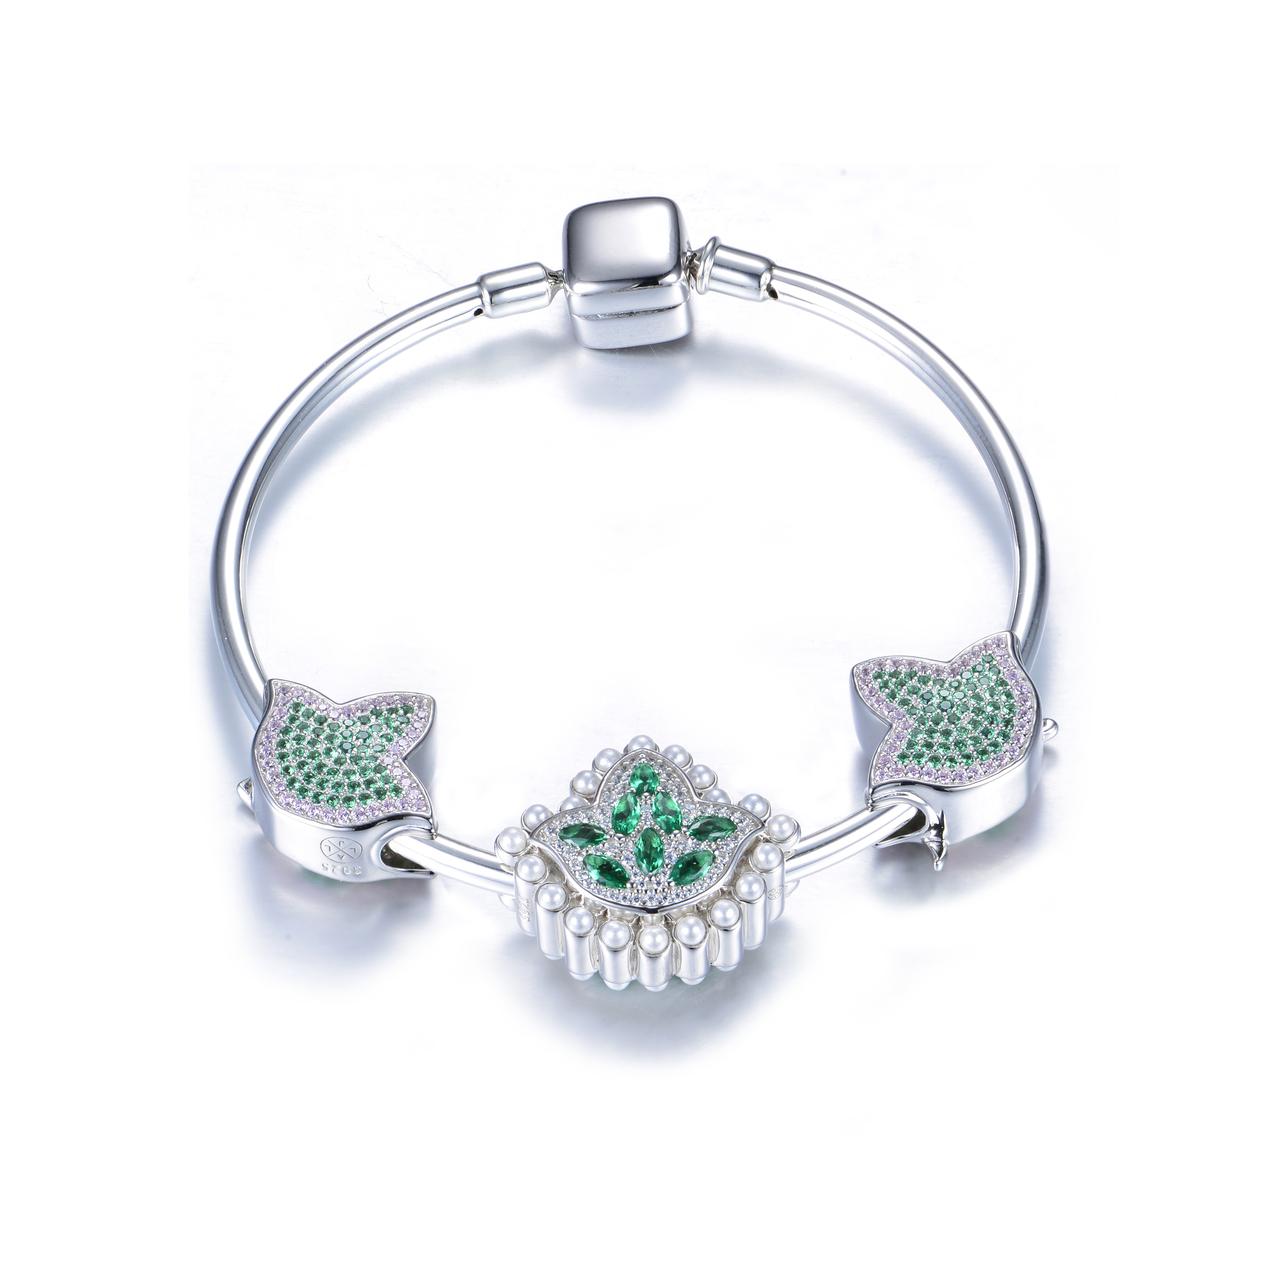 d36c699cf New Alpha Kappa Alpha Heirloom Bead Charm Bracelet - Angela Long ...